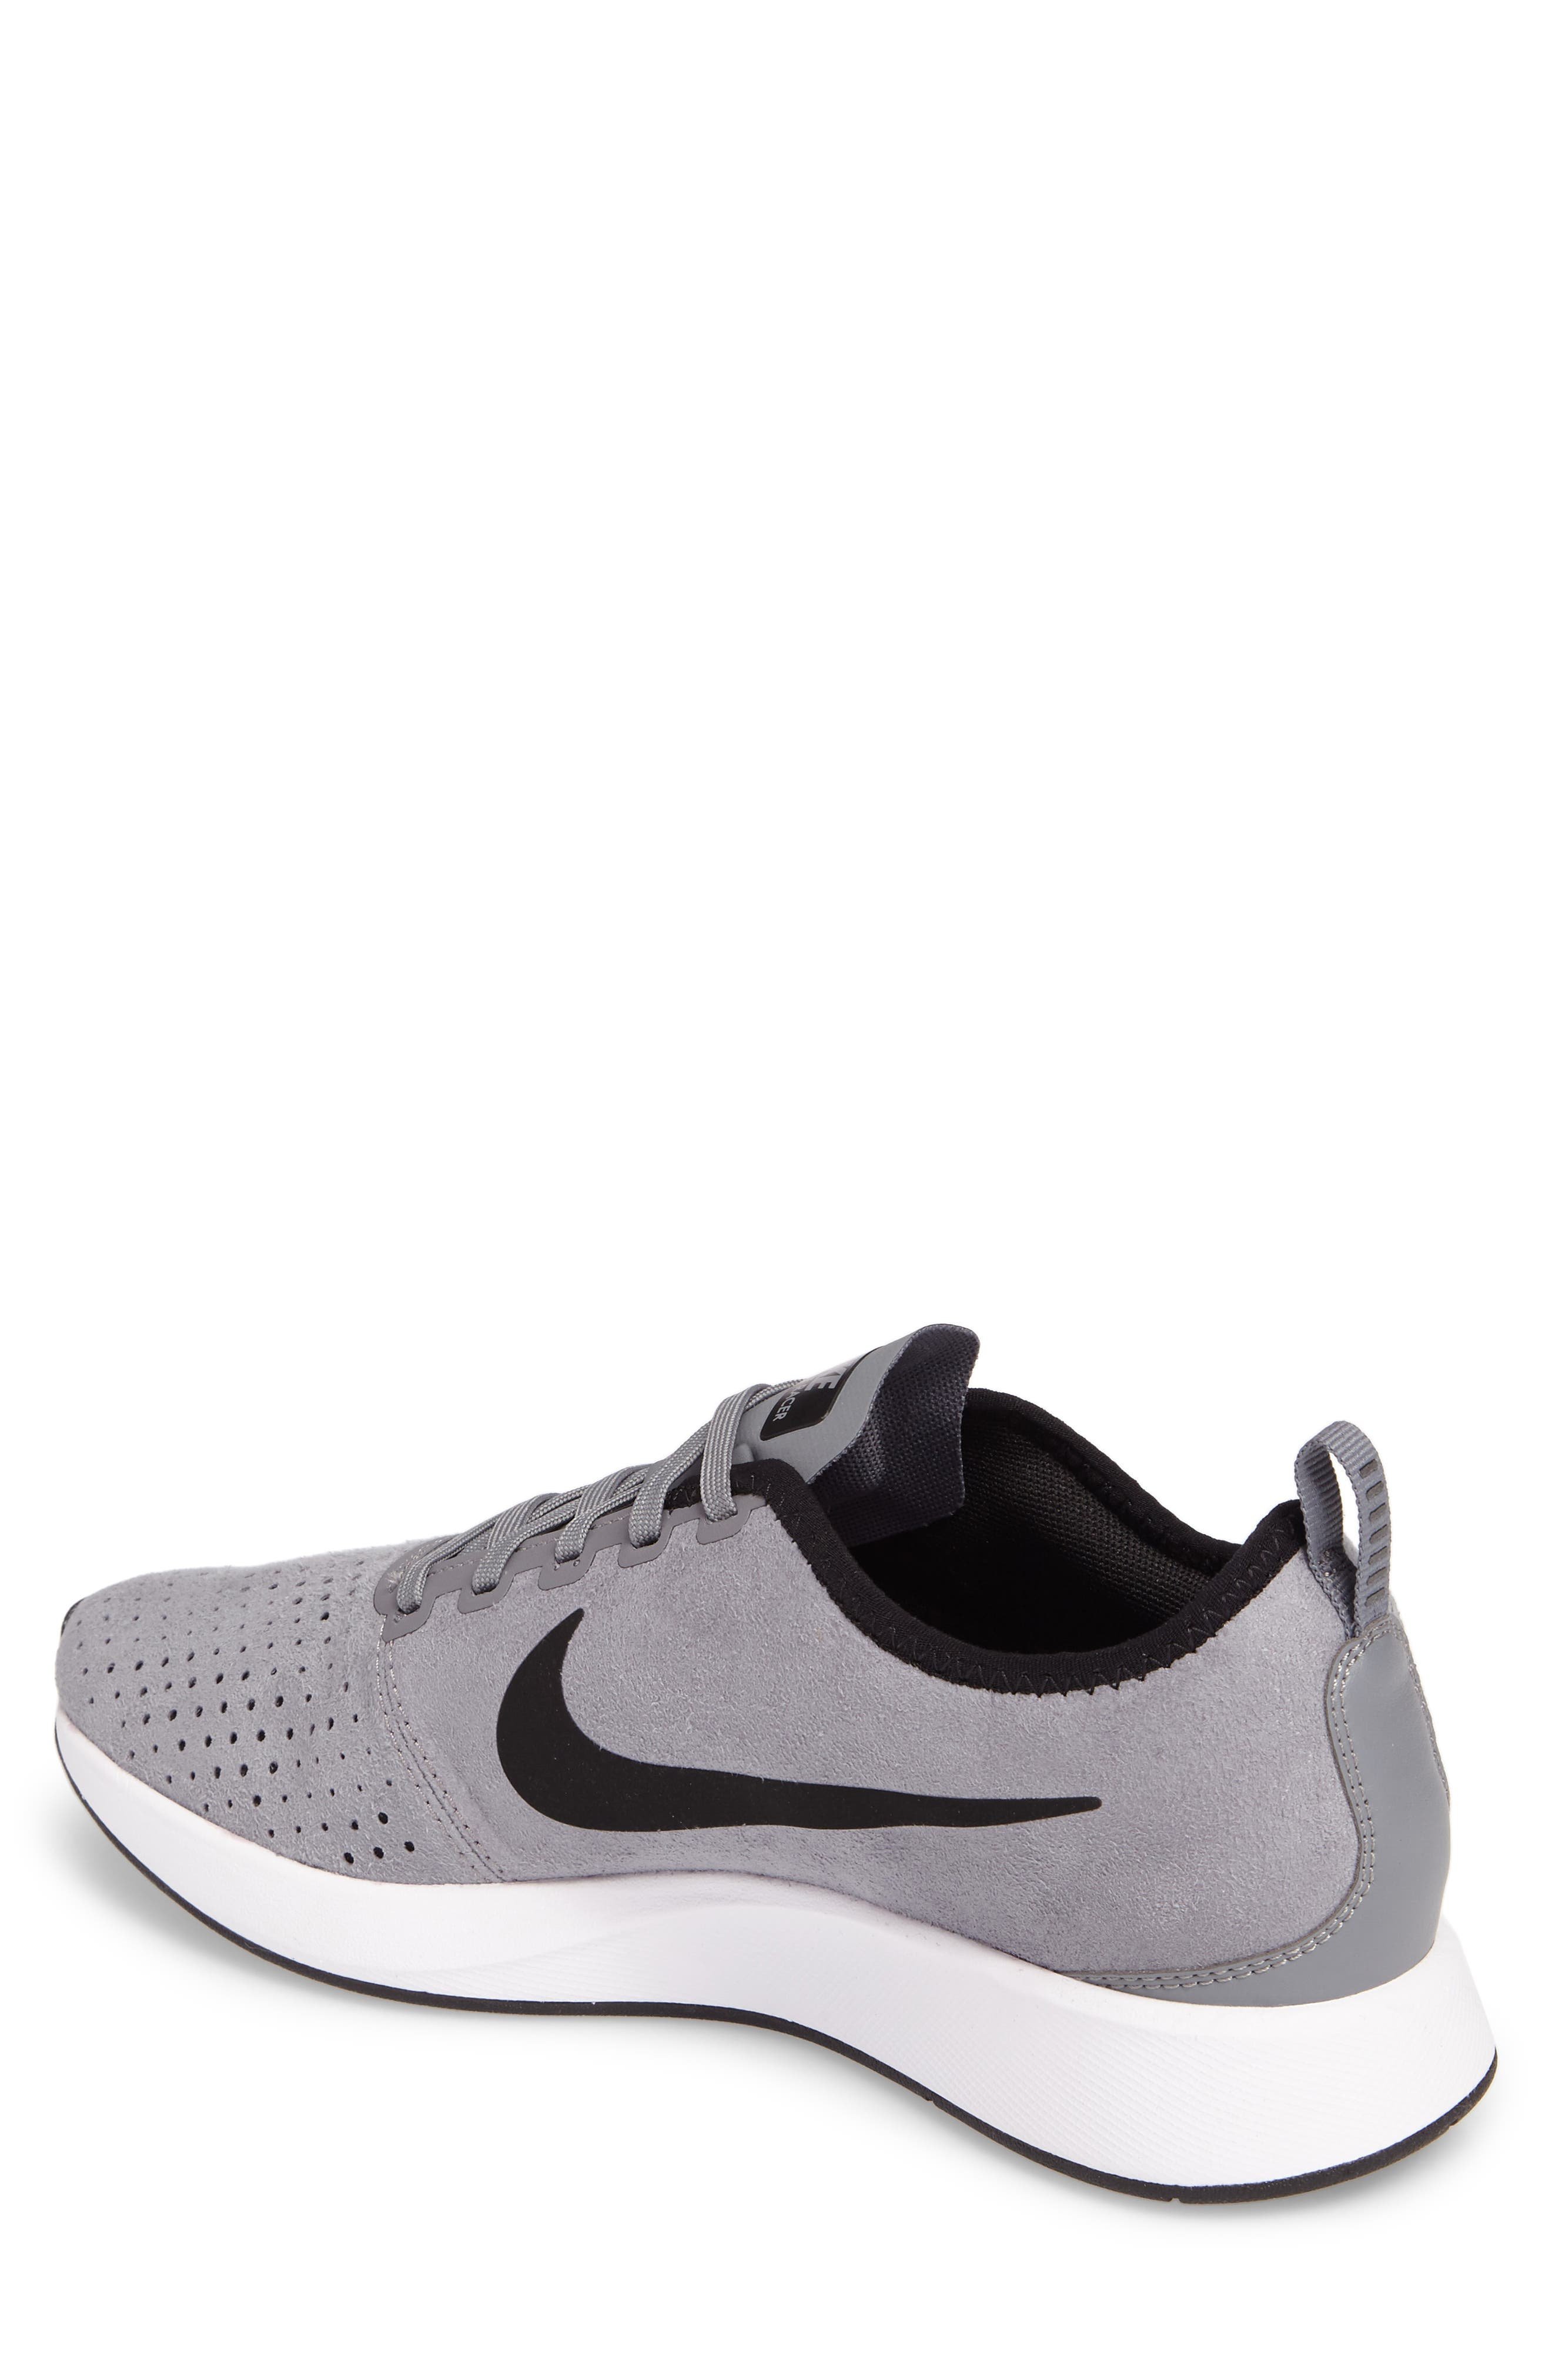 Alternate Image 2  - Nike Dualtone Racer Premium Sneaker (Men)